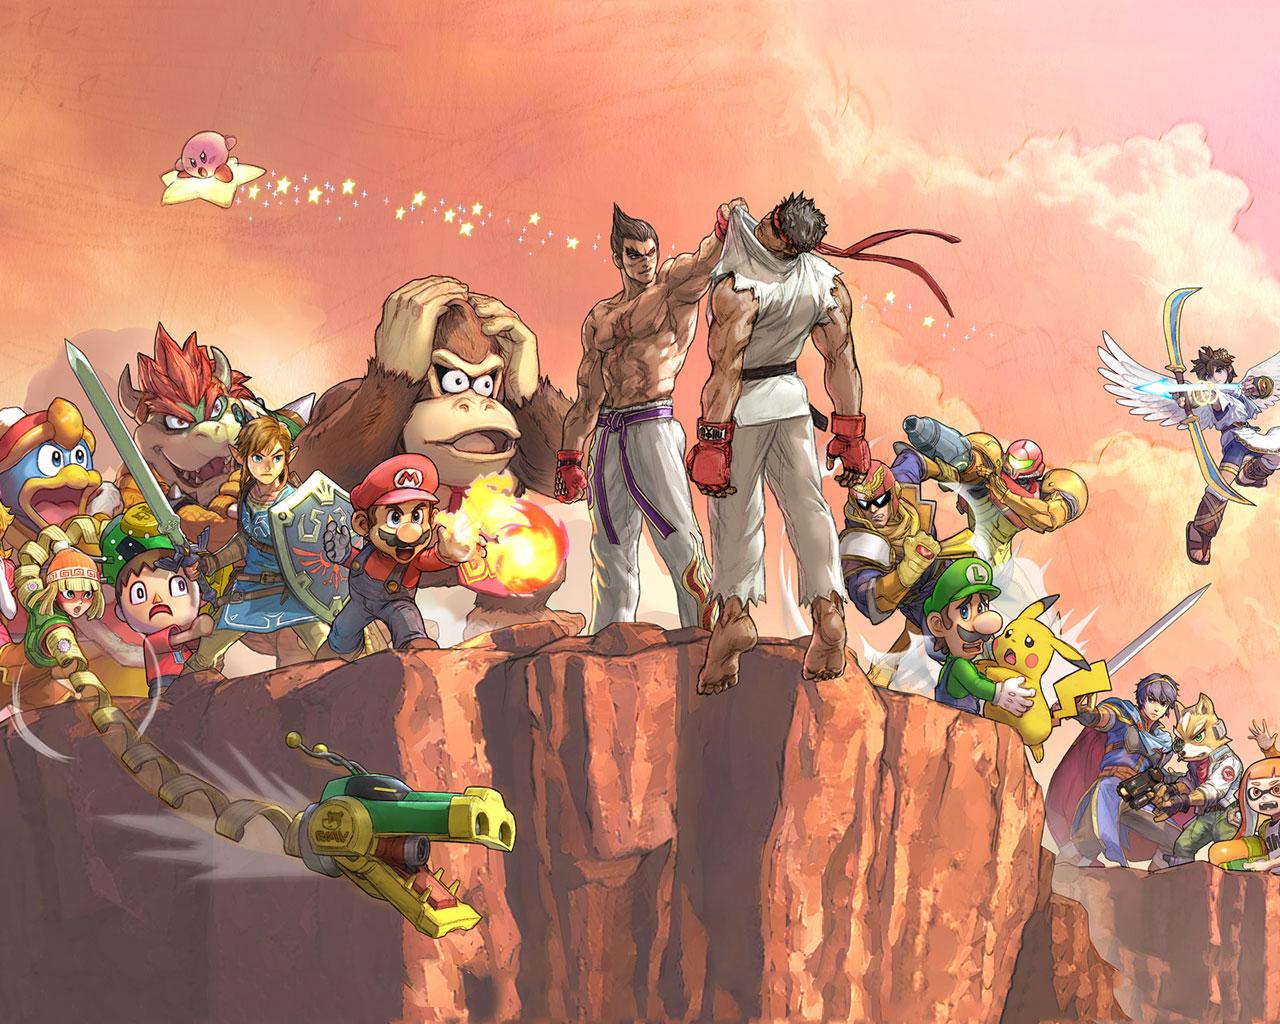 Free Super Smash Bros. Ultimate Wallpaper in 1280x1024